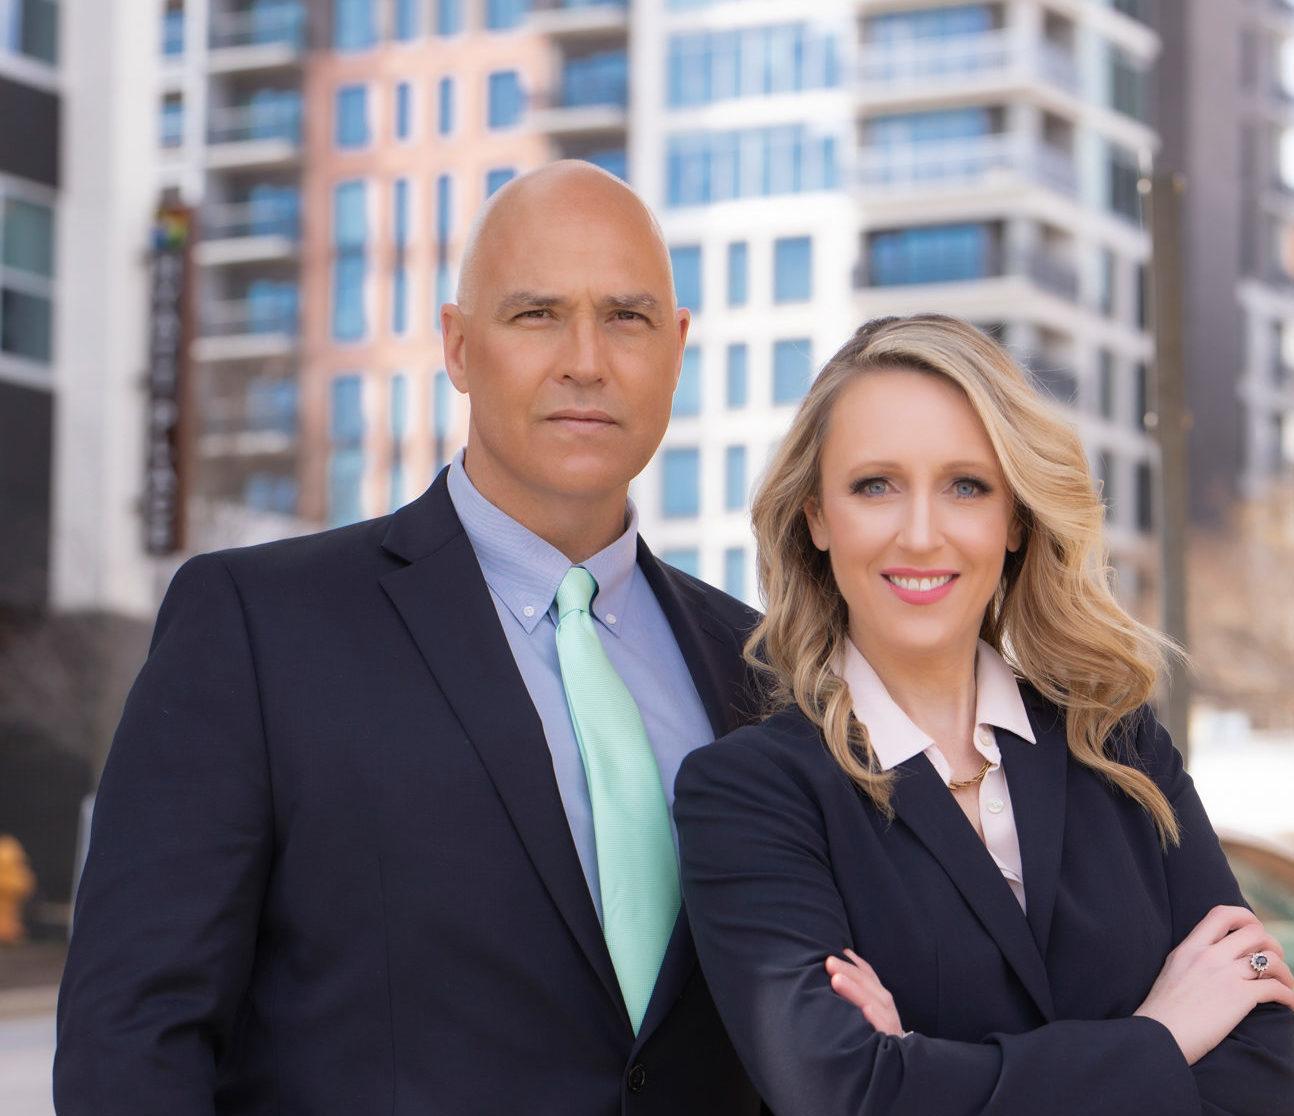 Upstate Personal Injury Lawyers, LLC Profile Picture